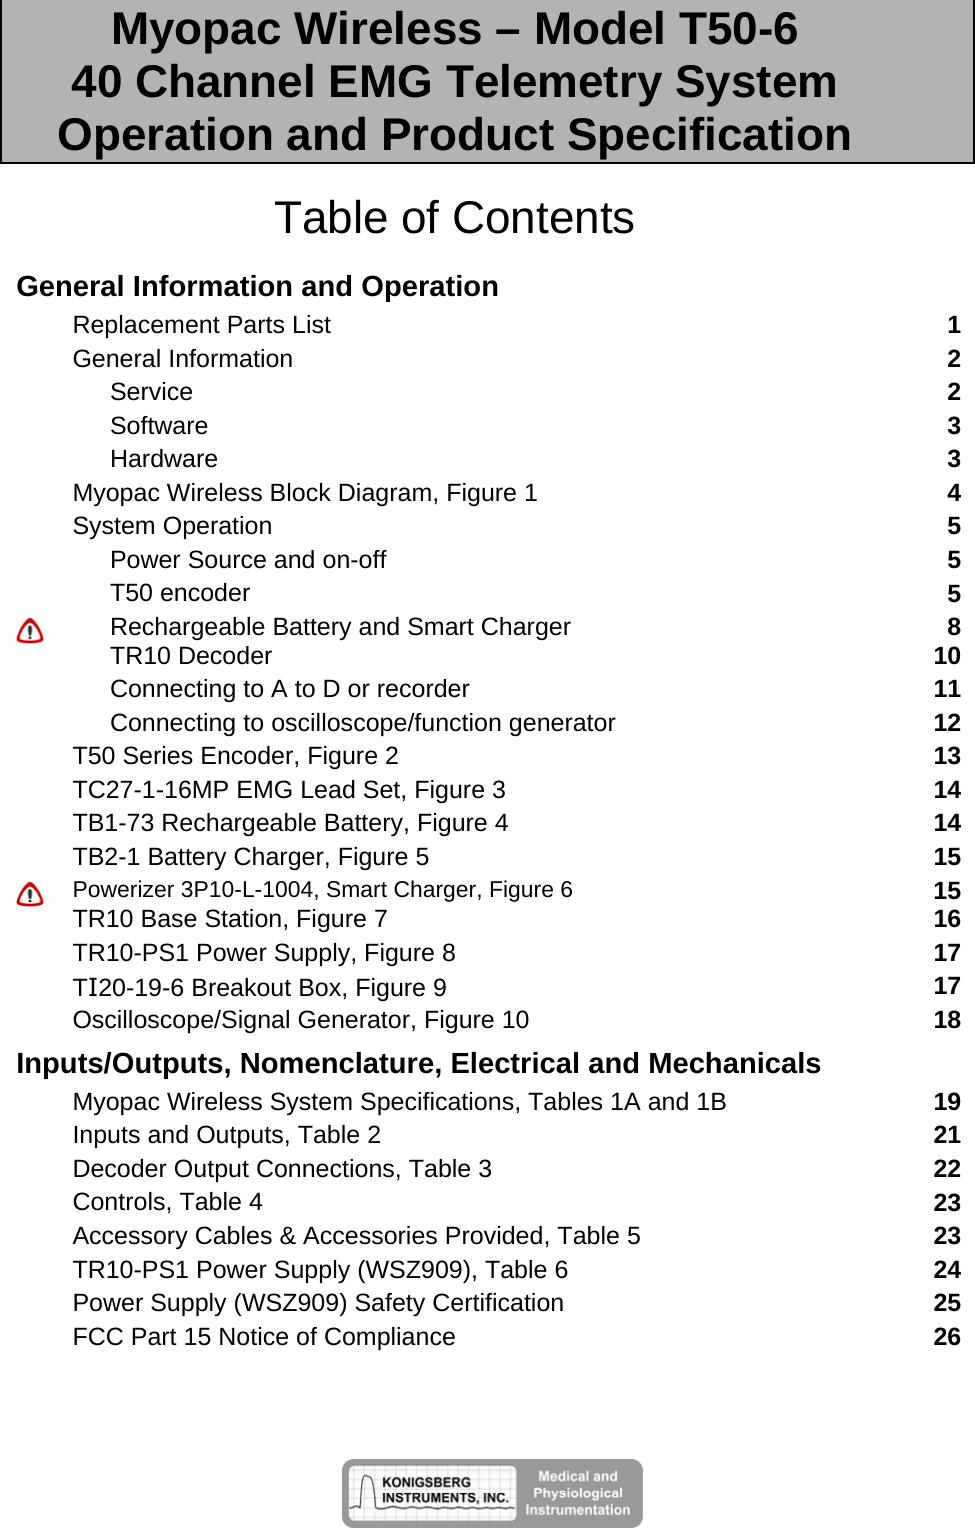 konigsberg instruments t50 myopac wireless transmitter user manual 1 rh usermanual wiki Apple iPhone User Manual LG Phone User Guide